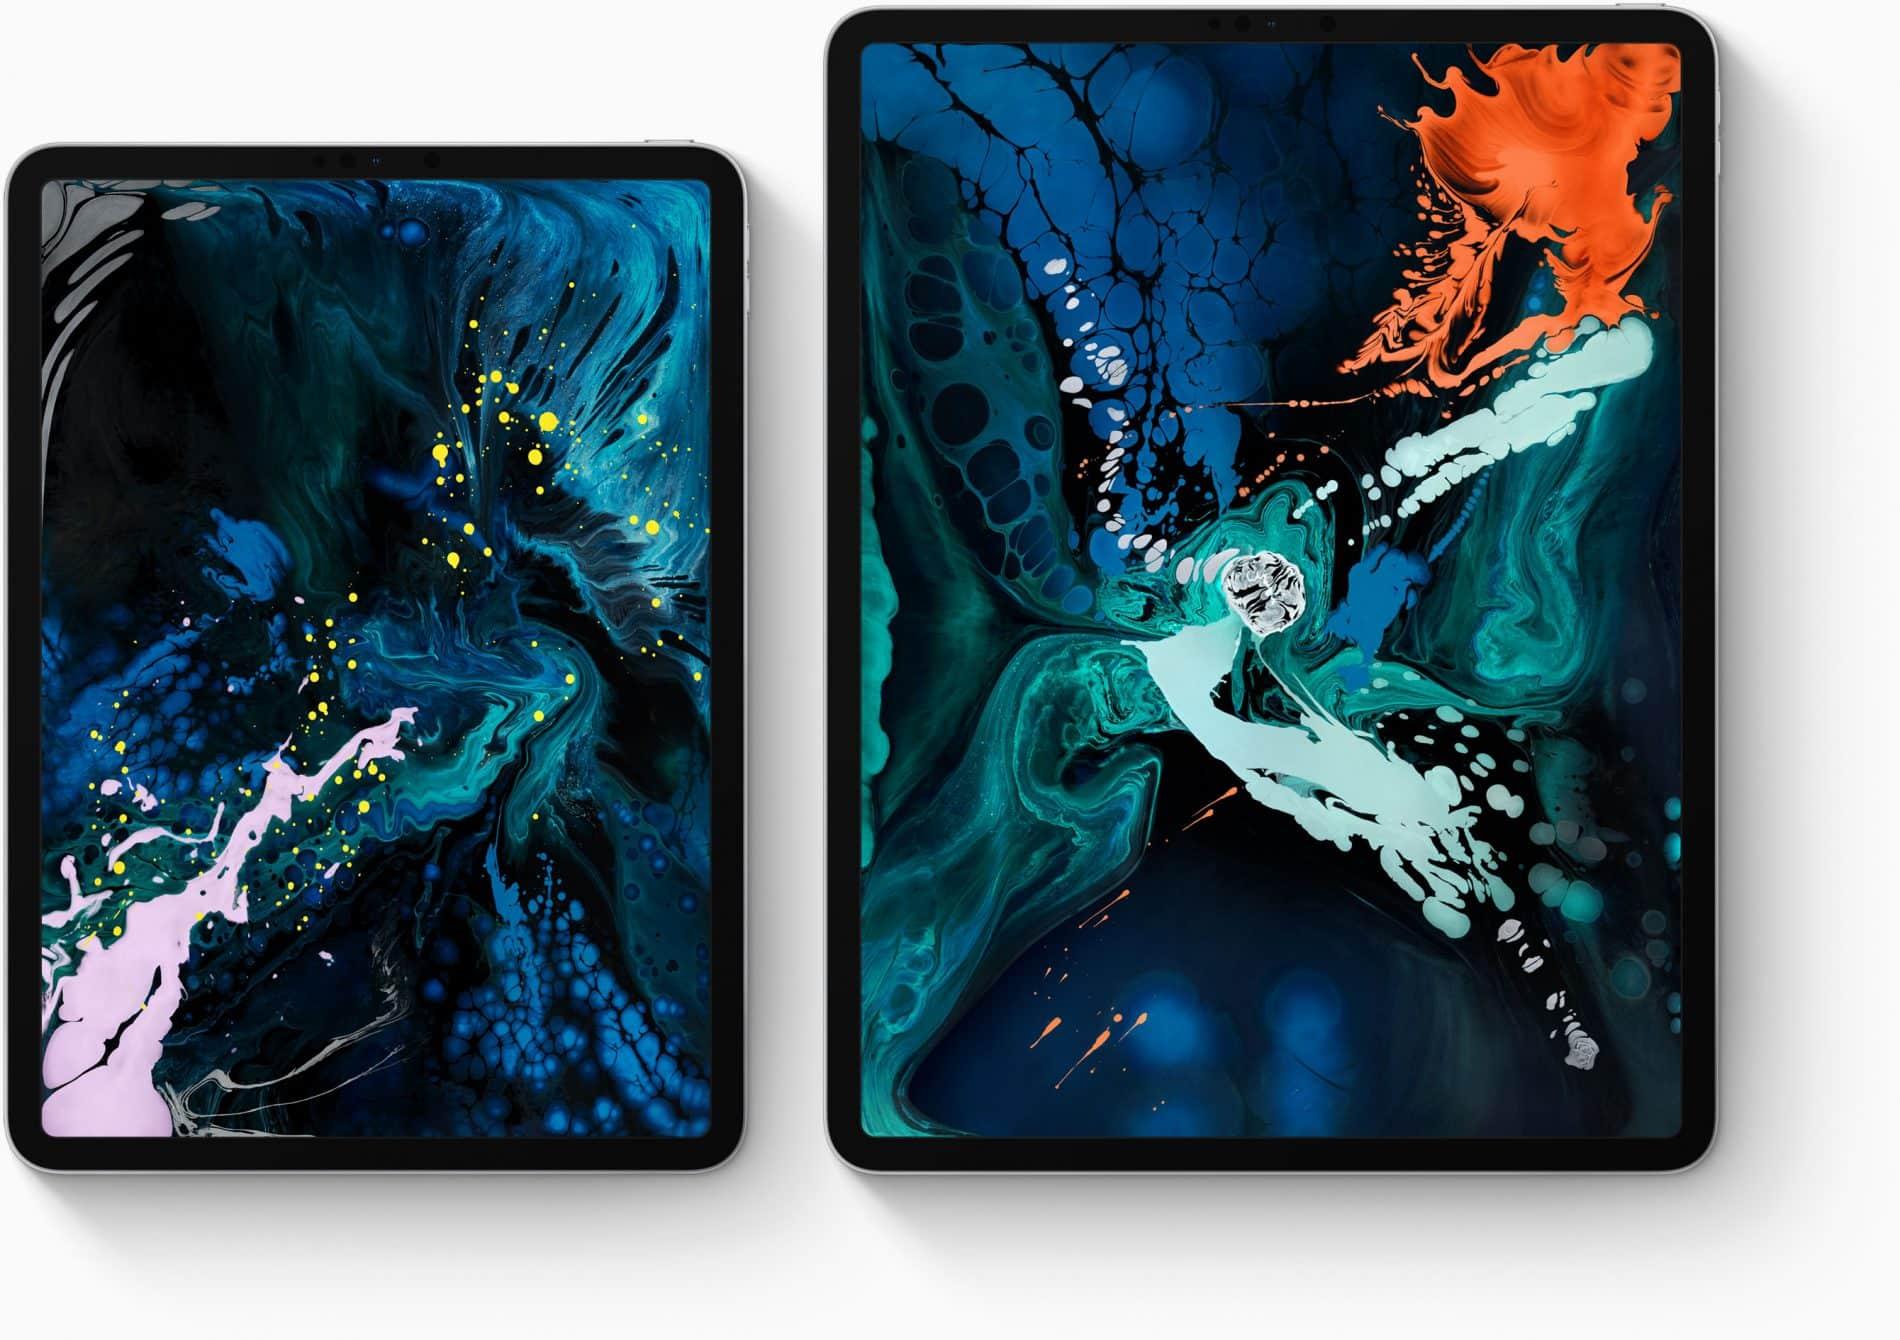 Apple iPad Pro 2018 11 12,9 Zoll Tablet Computer CCT Communikation Uwe Gillner Augsburg Handy Smartphone Mobilfunk Internet Telekom Vodafone Service Update Vertragsverlängerung